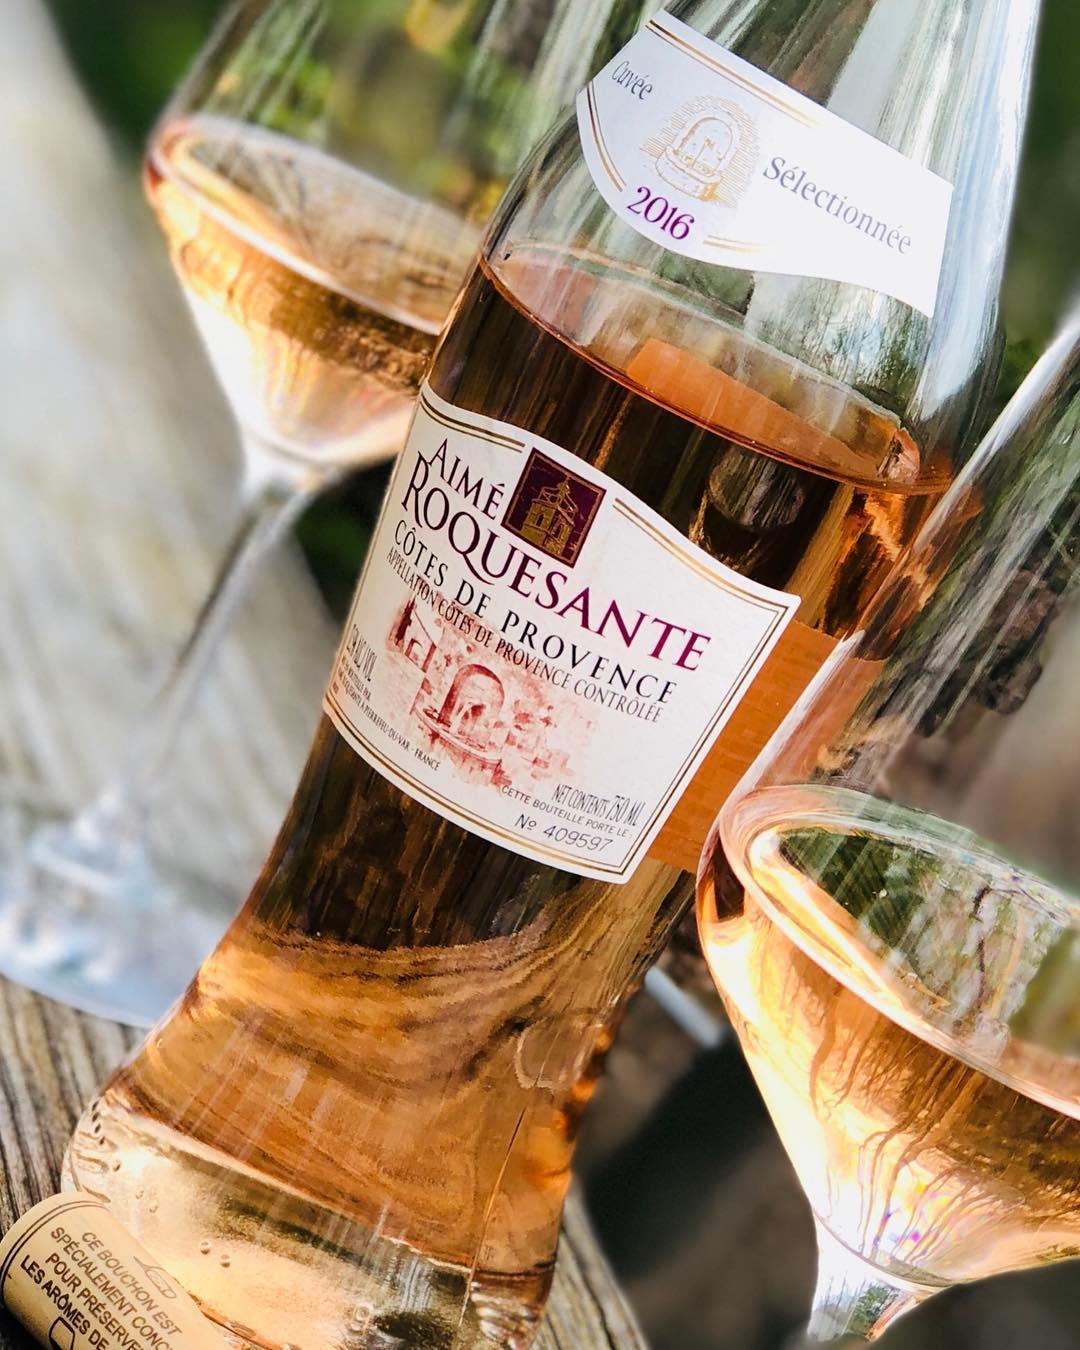 aime roquesante wine.jpg